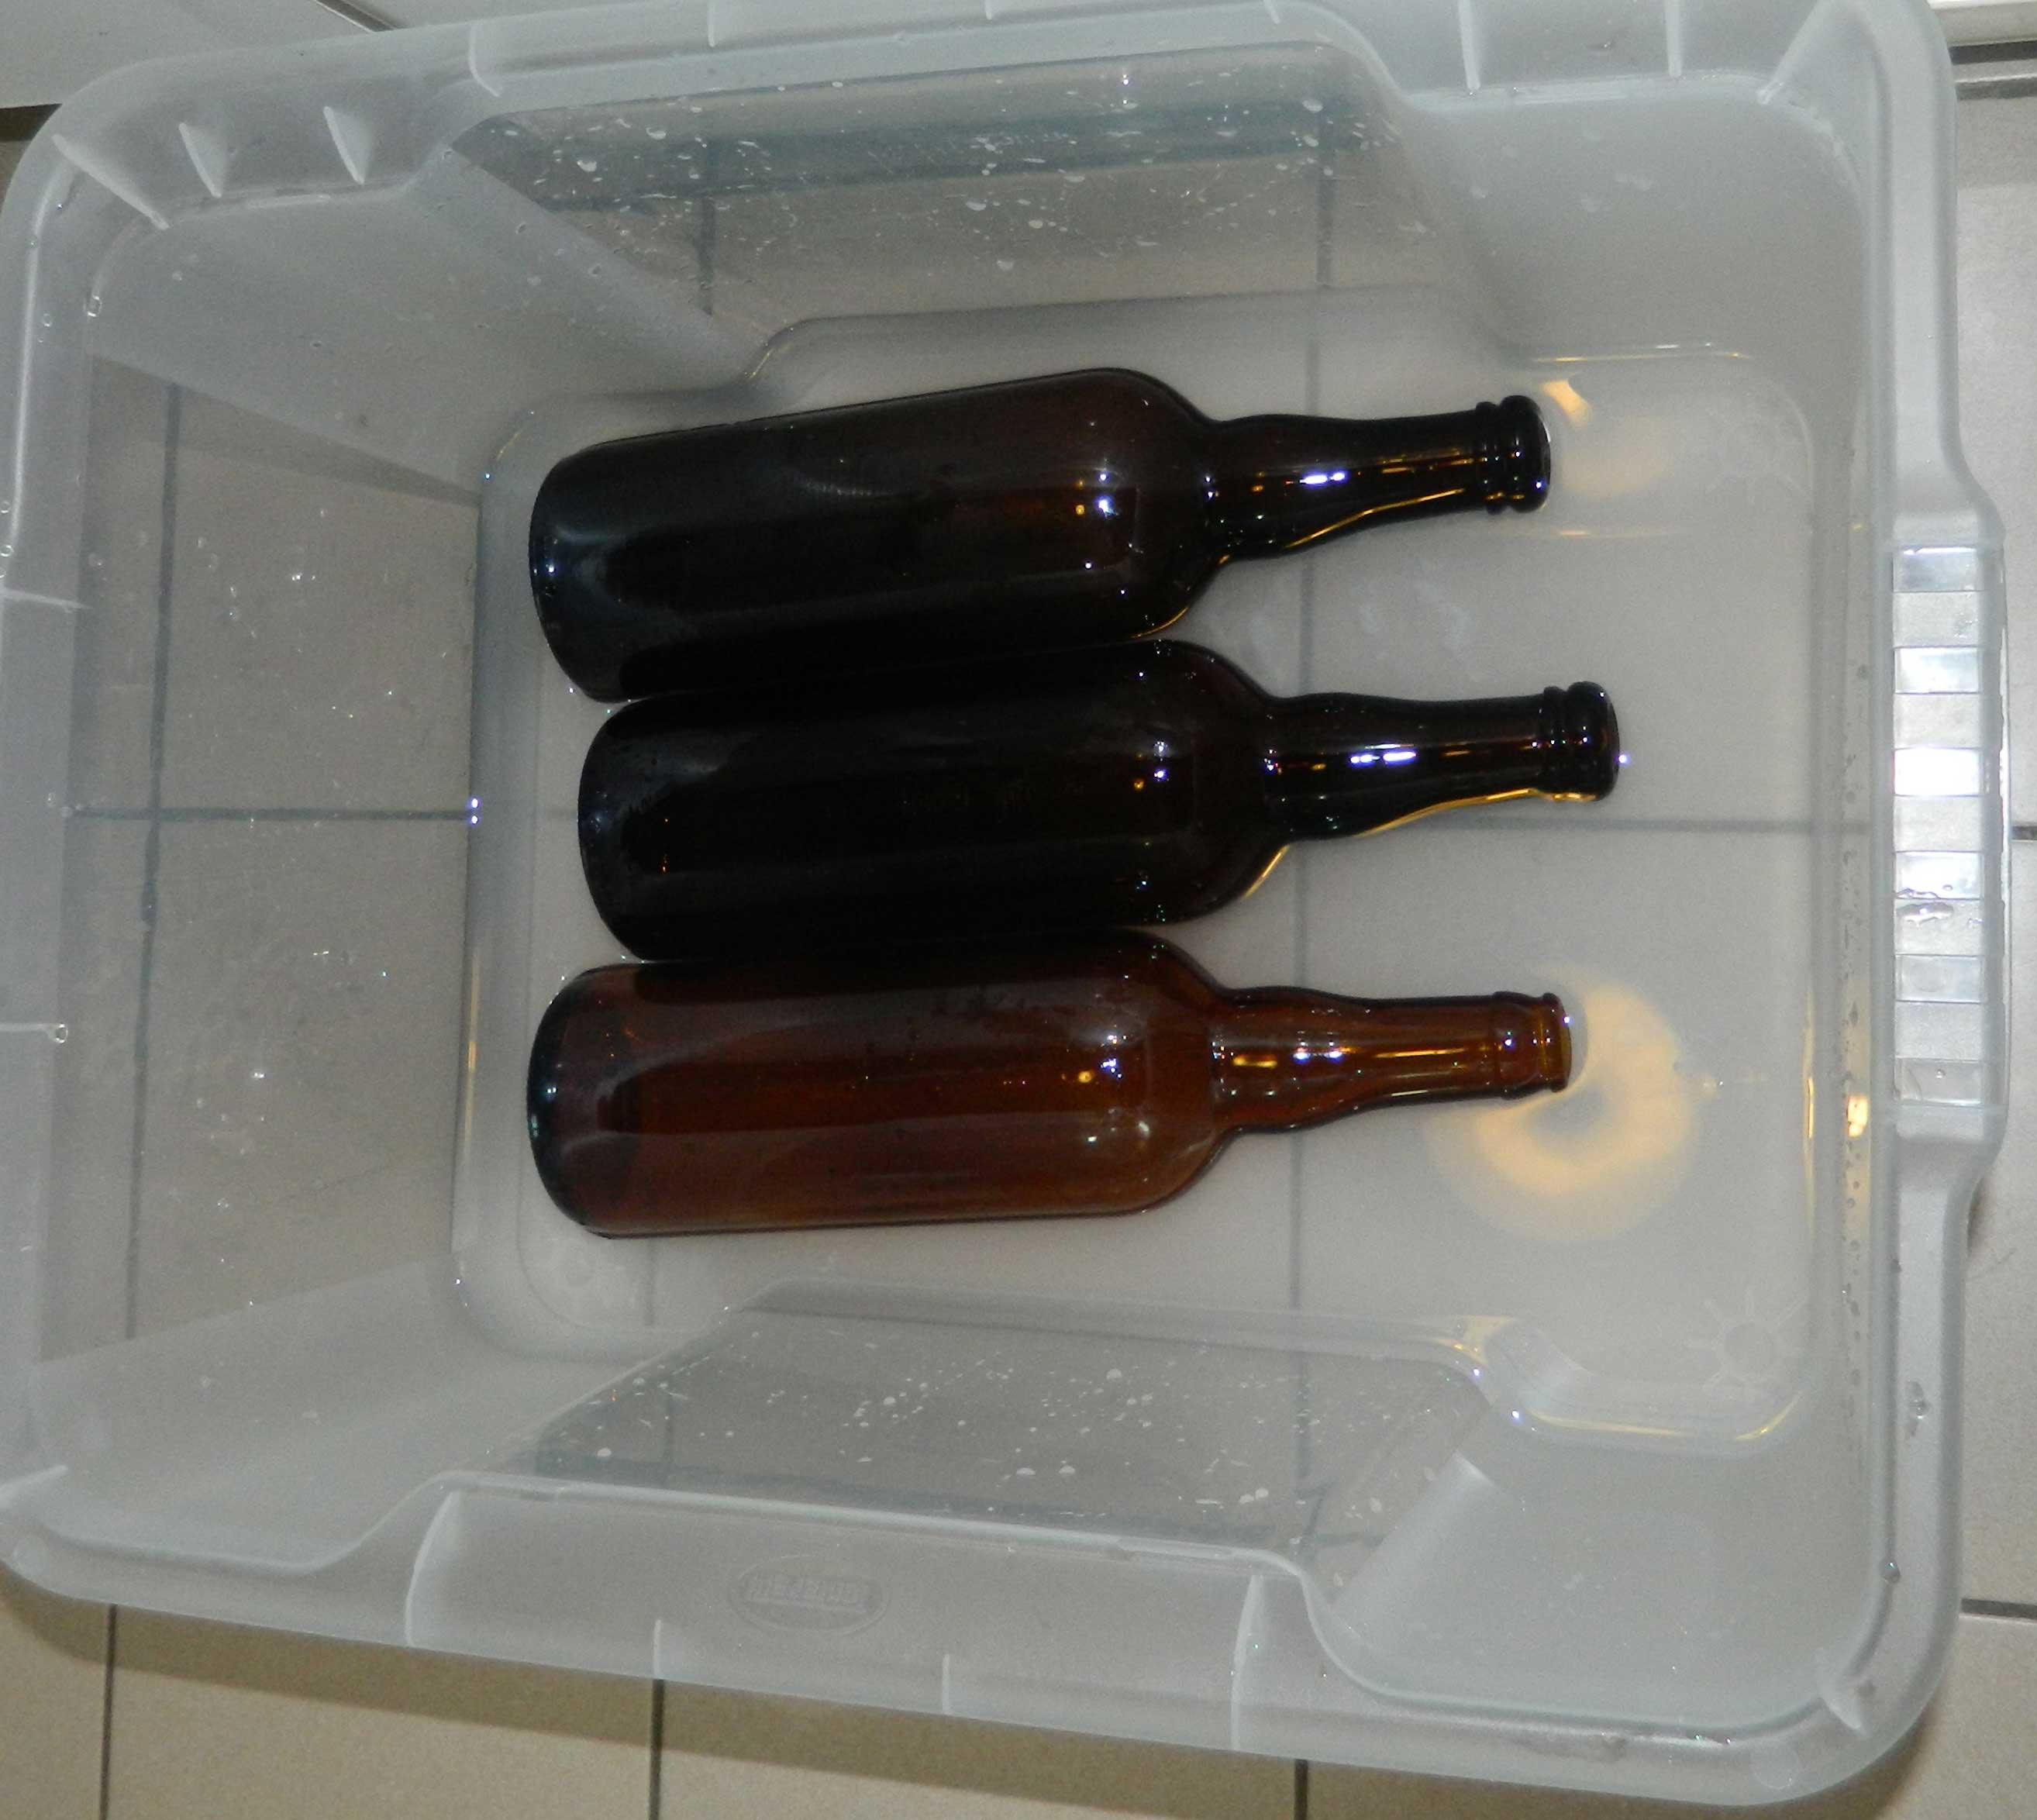 18-bouteilles.jpg